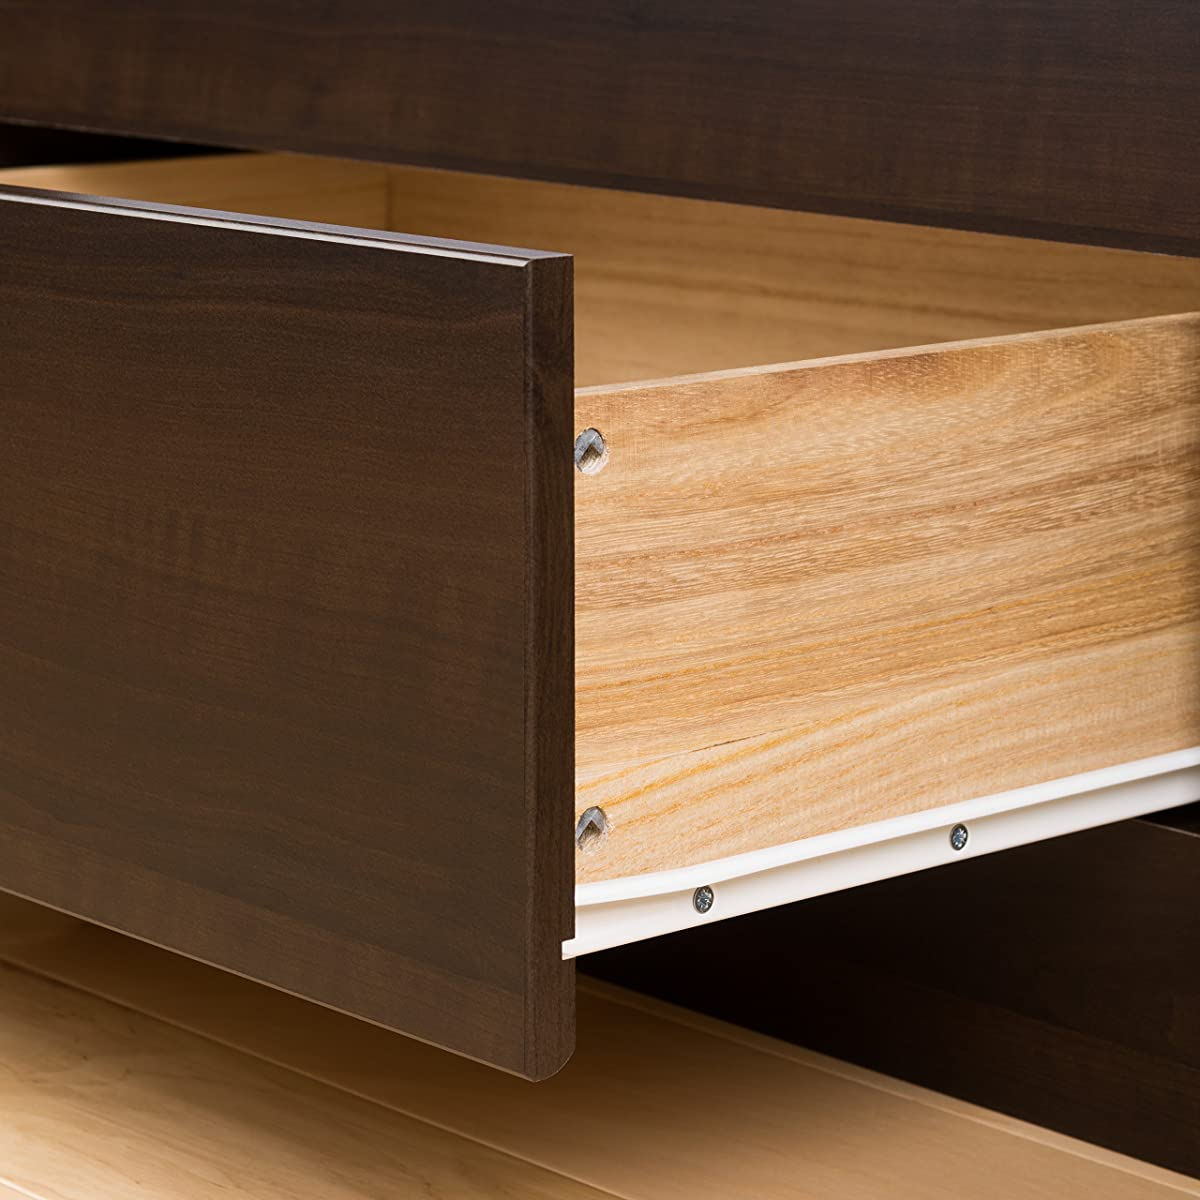 Prepac Espresso Full Mate's Platform Storage Bed with 6 Drawers